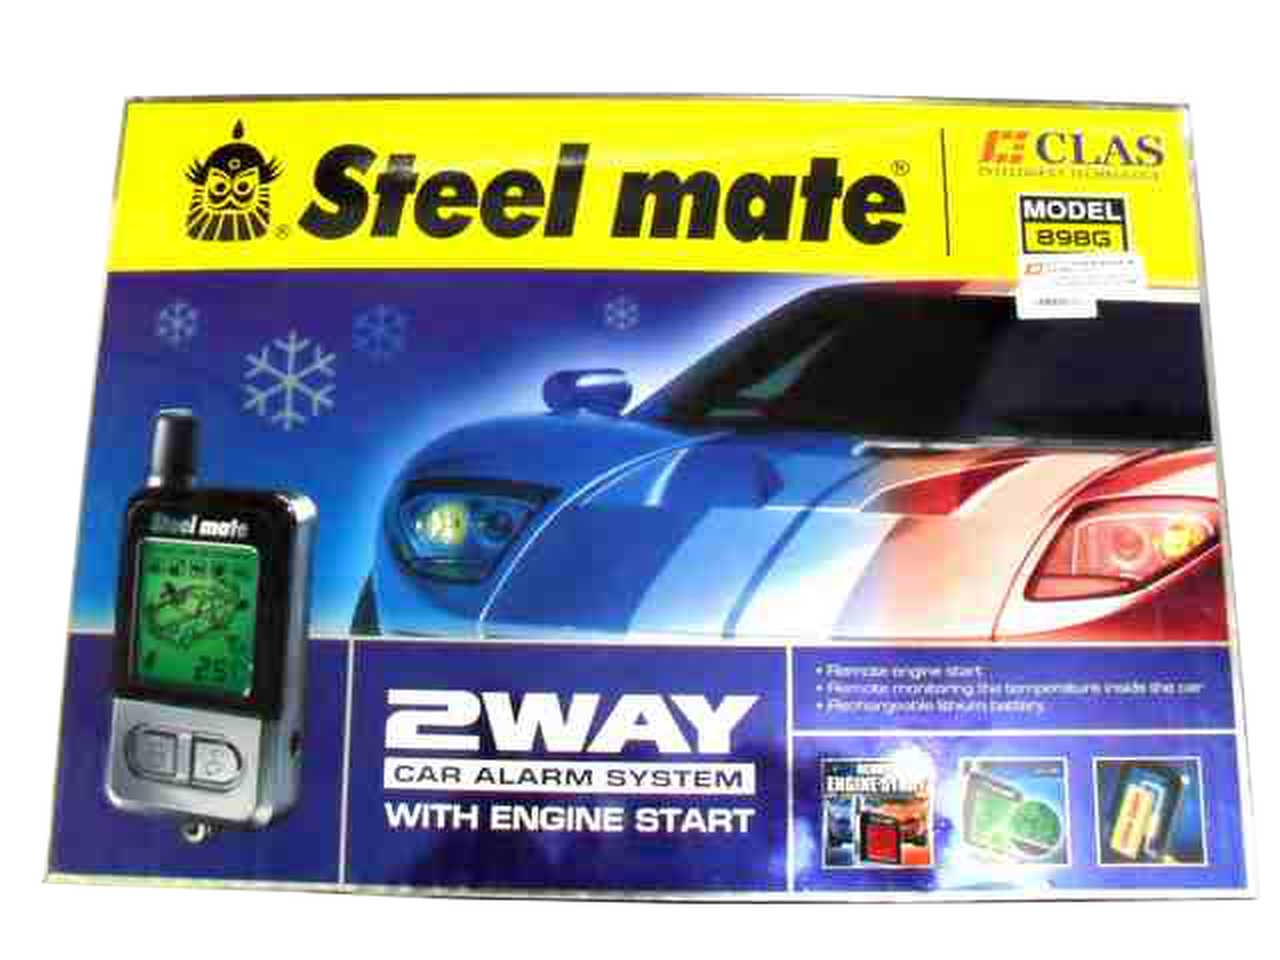 steelmate car alarm wiring diagram 2003 vw passat new steel mate 898g 2 way lcd remote engine